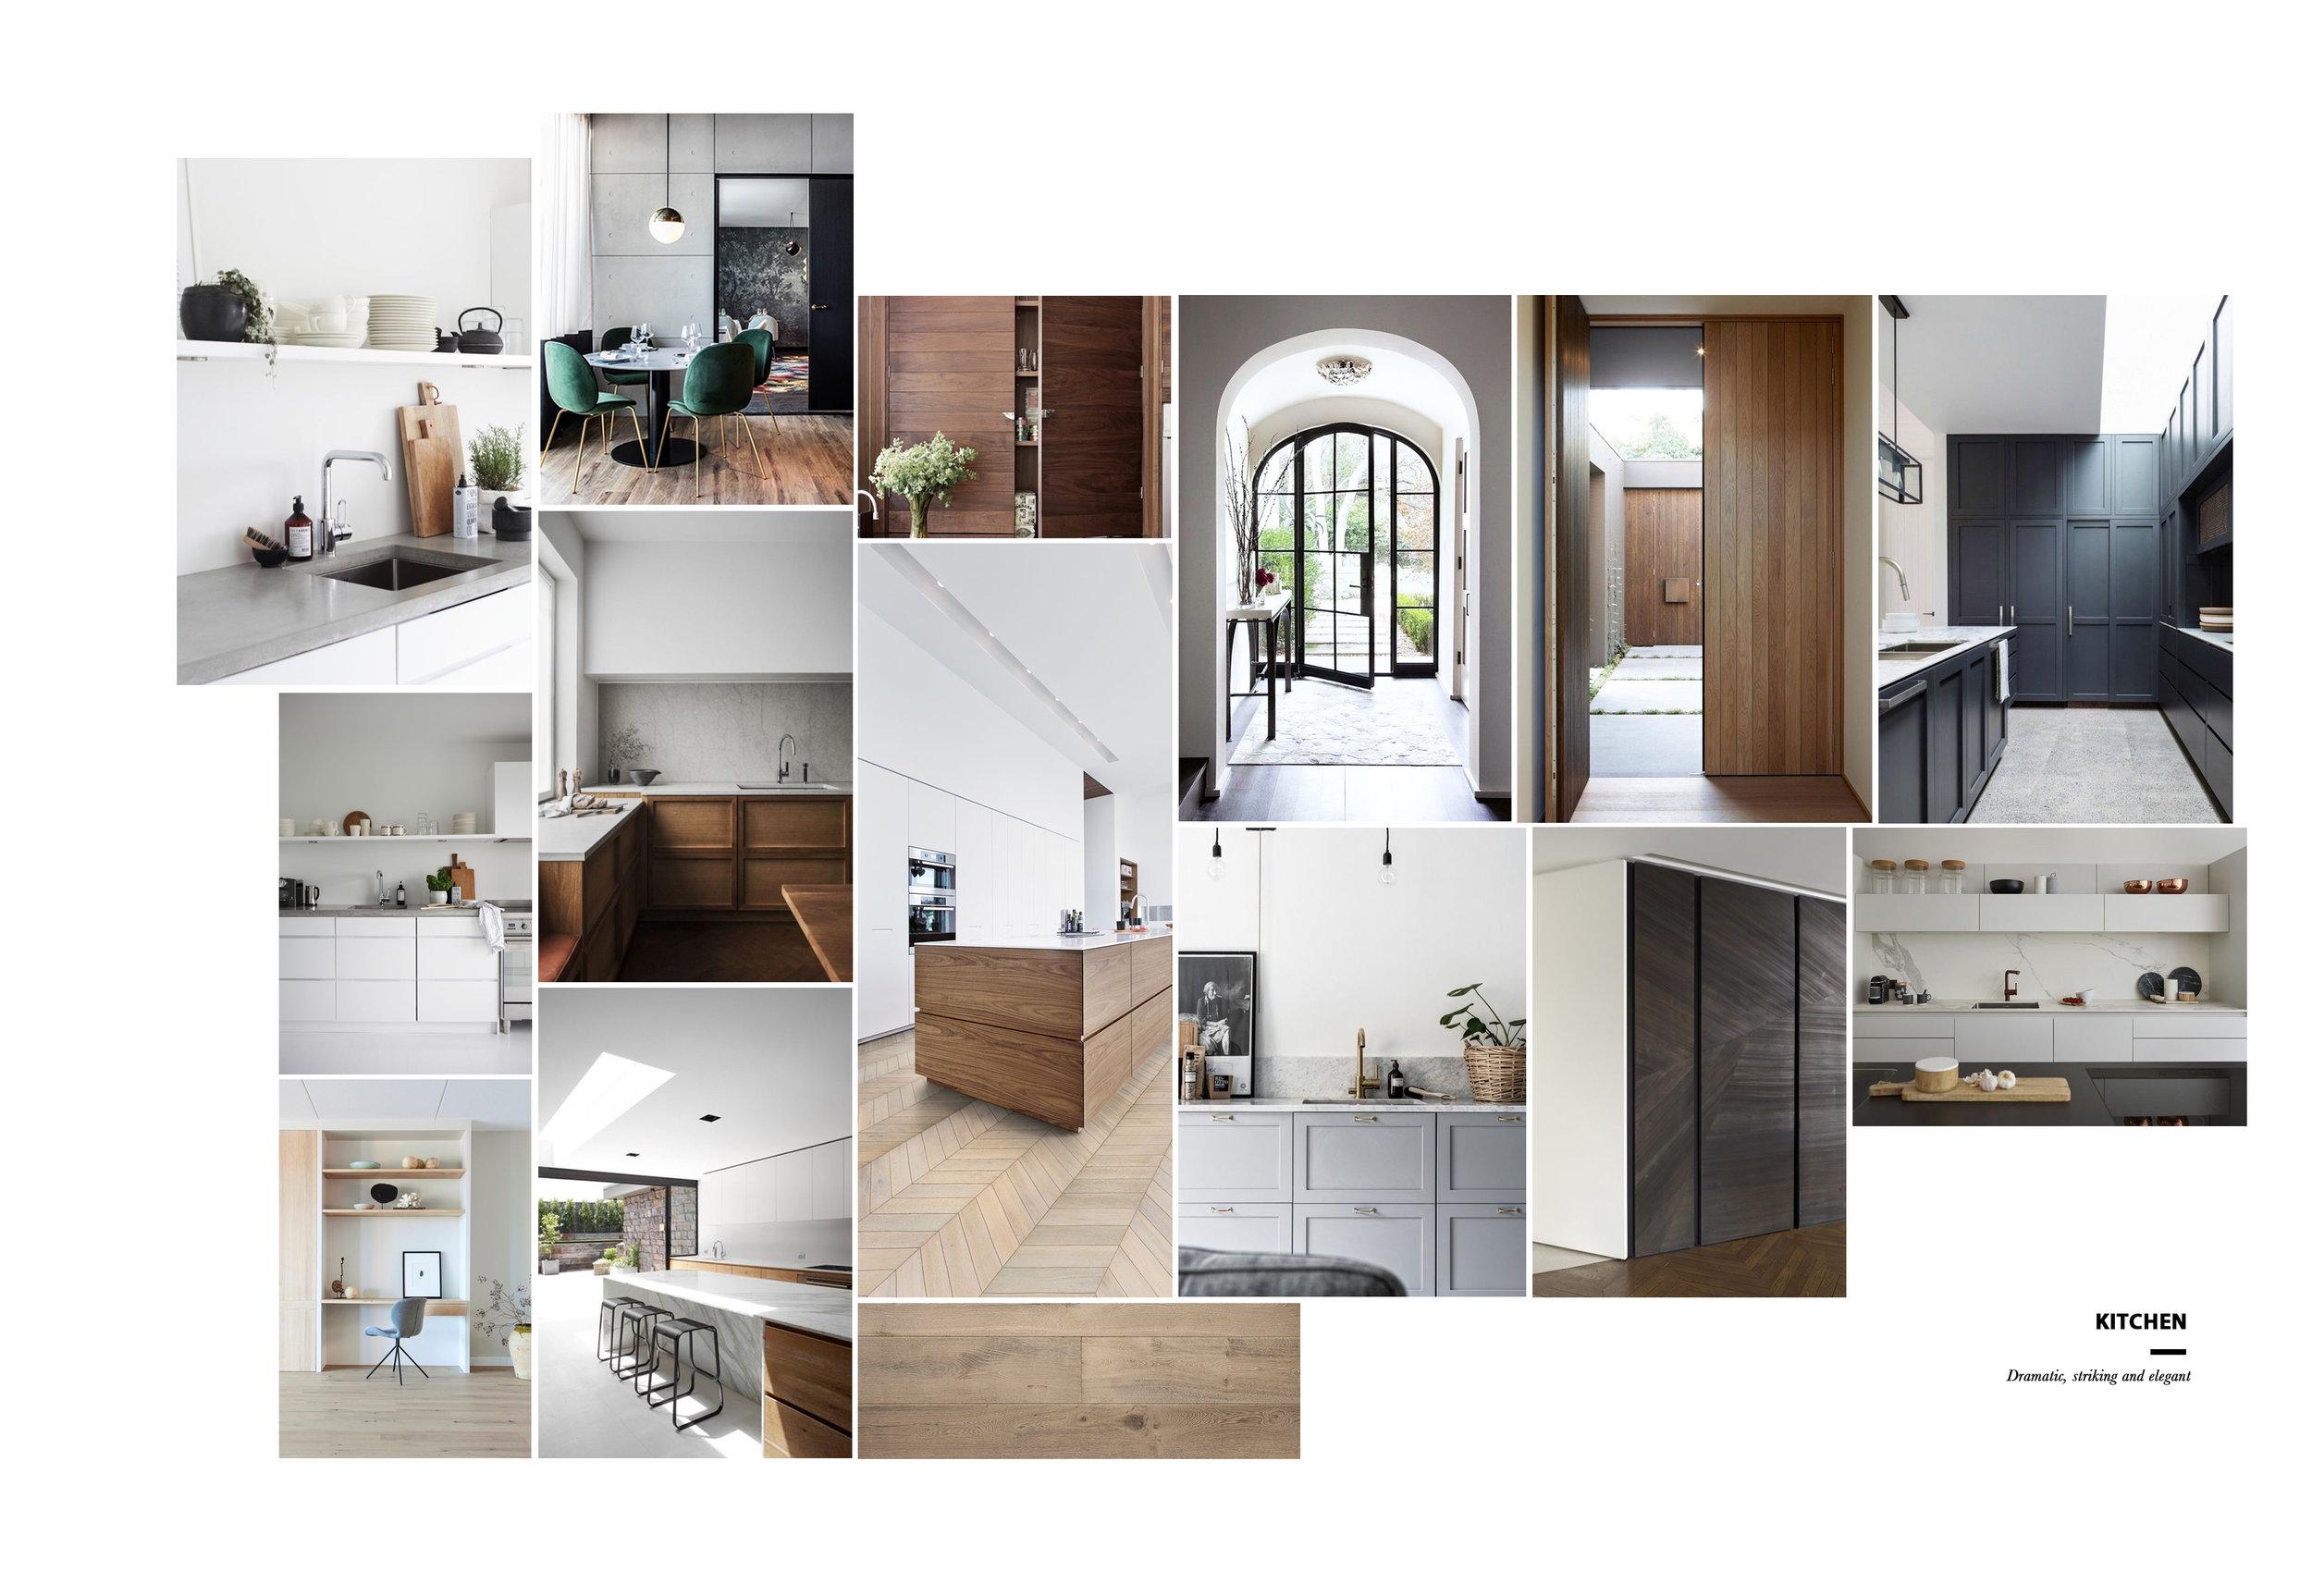 EB Interiors kitchen inspiration board.jpg